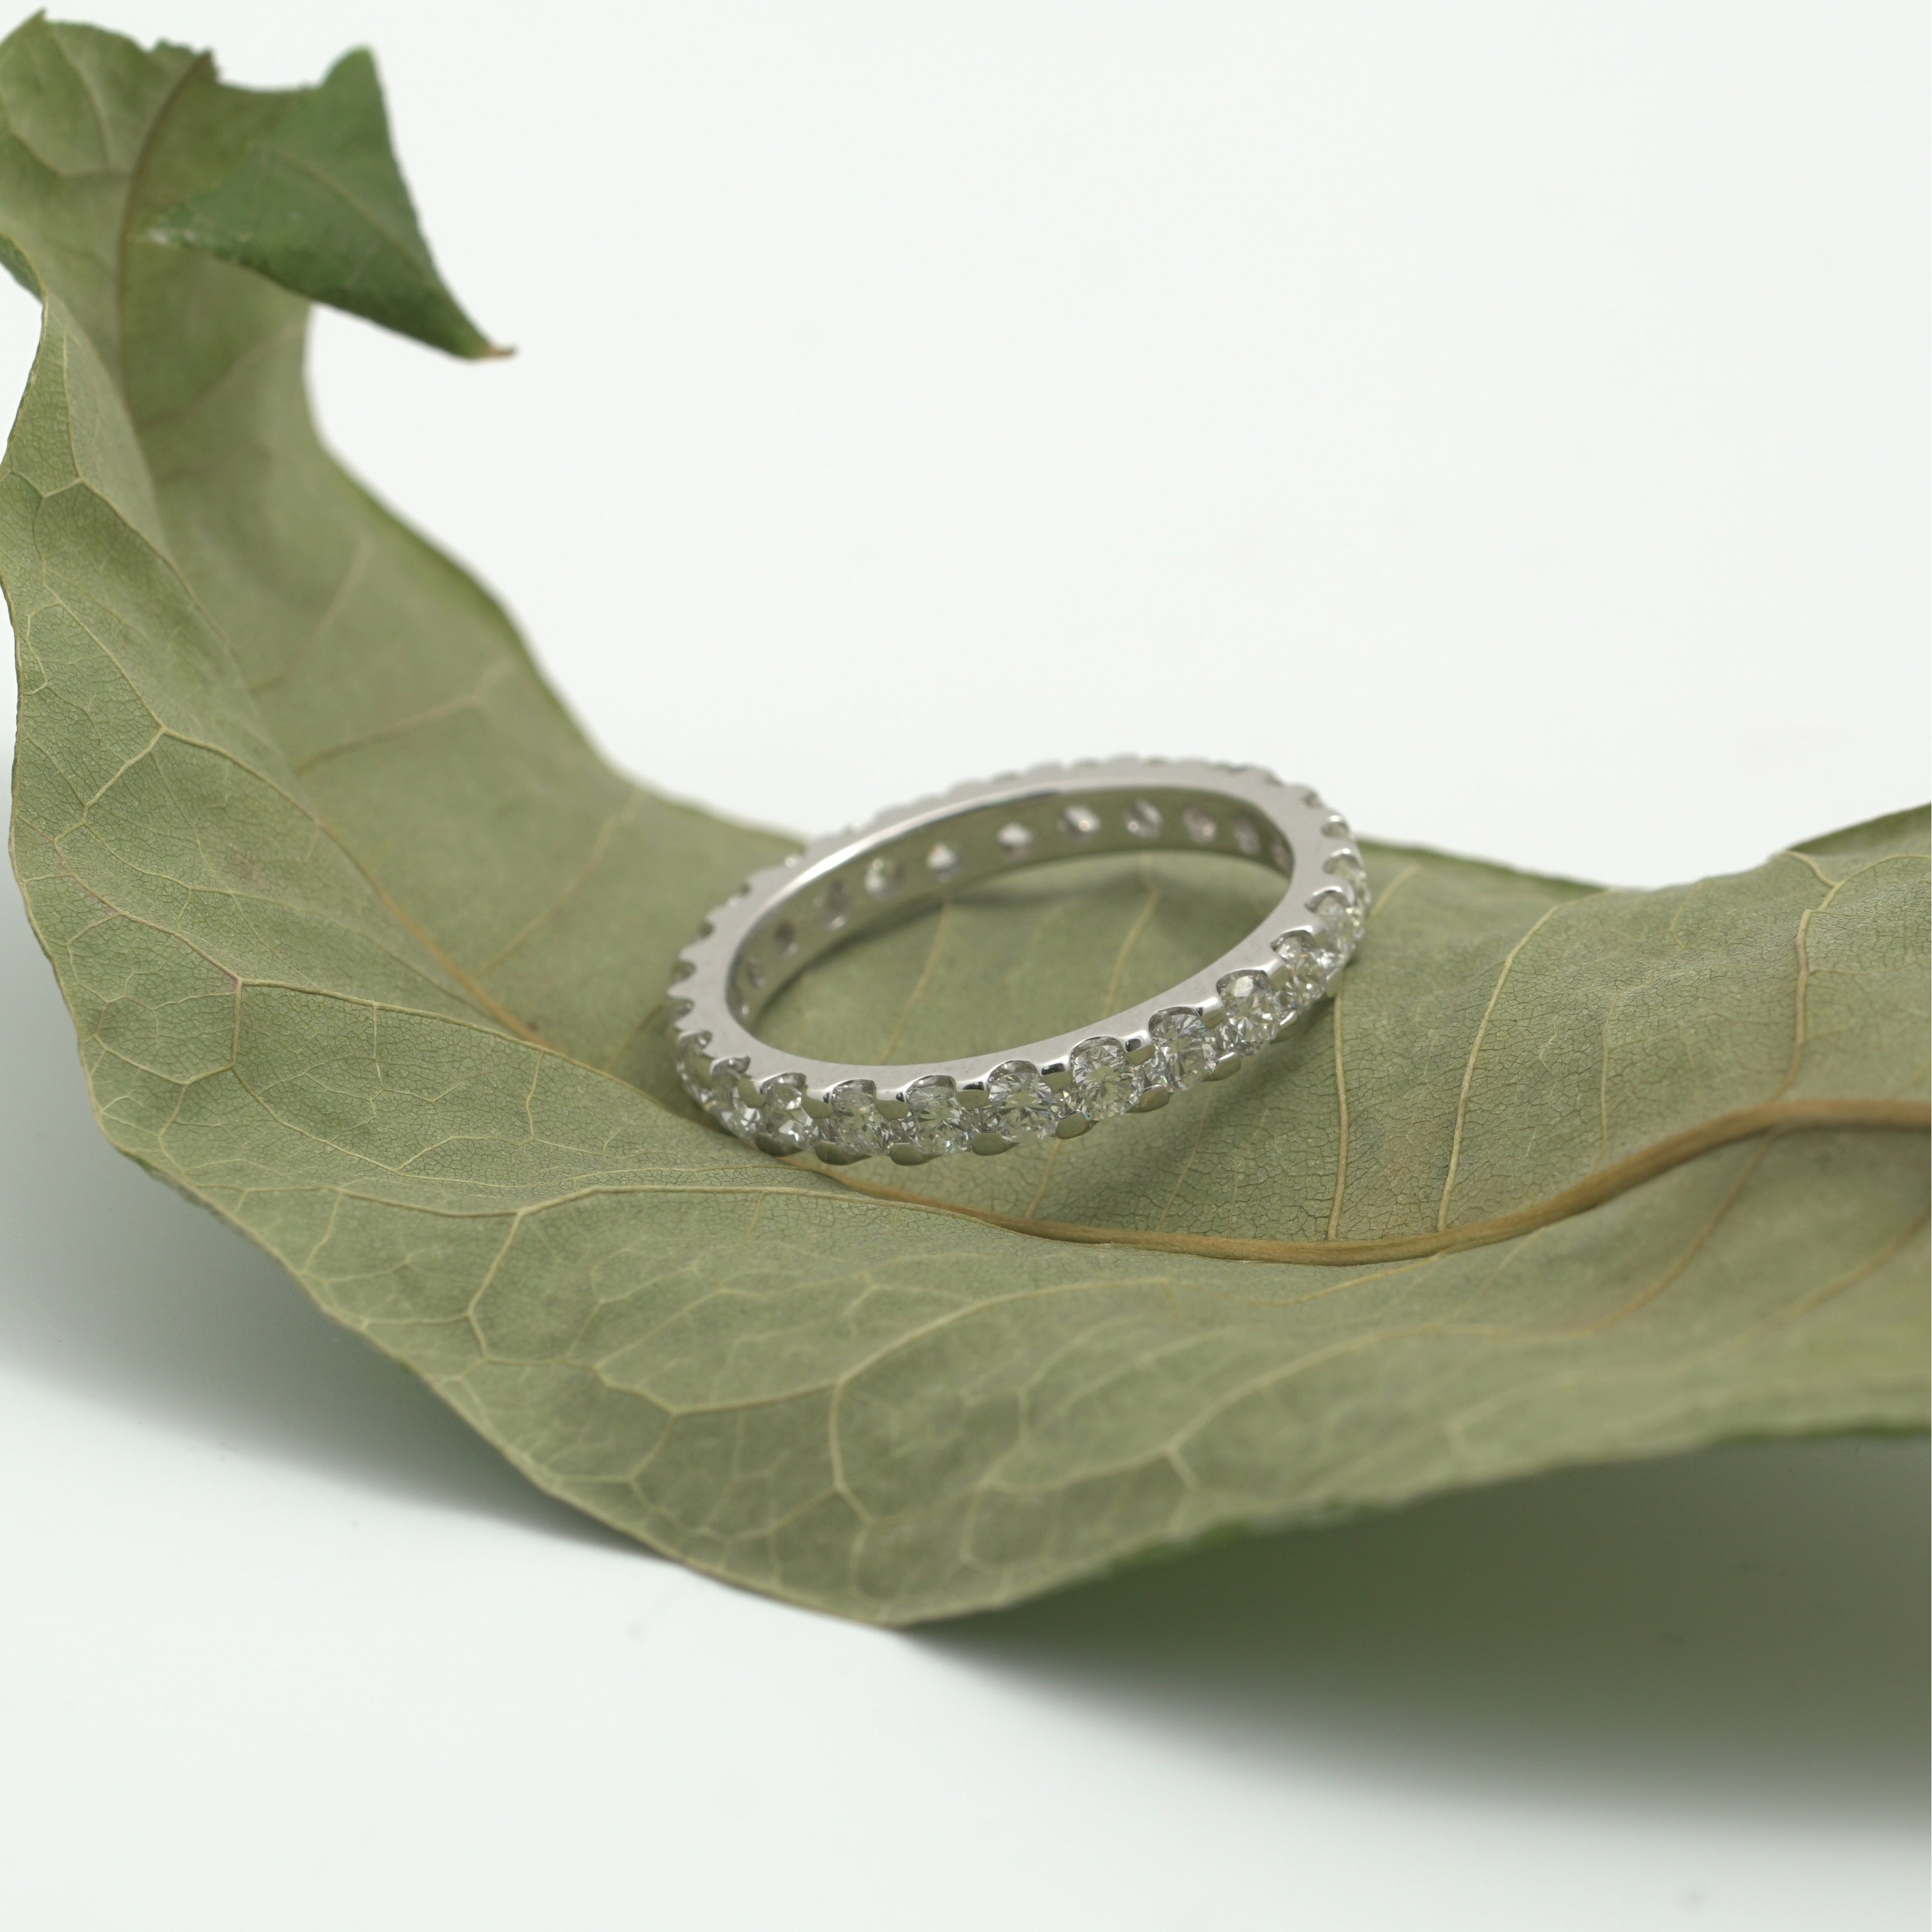 14K White Gold 1.40 cttw. Round Cut Shared Prong Diamond Eternity Wedding Ring HI,SI1-2 - Thumbnail 0